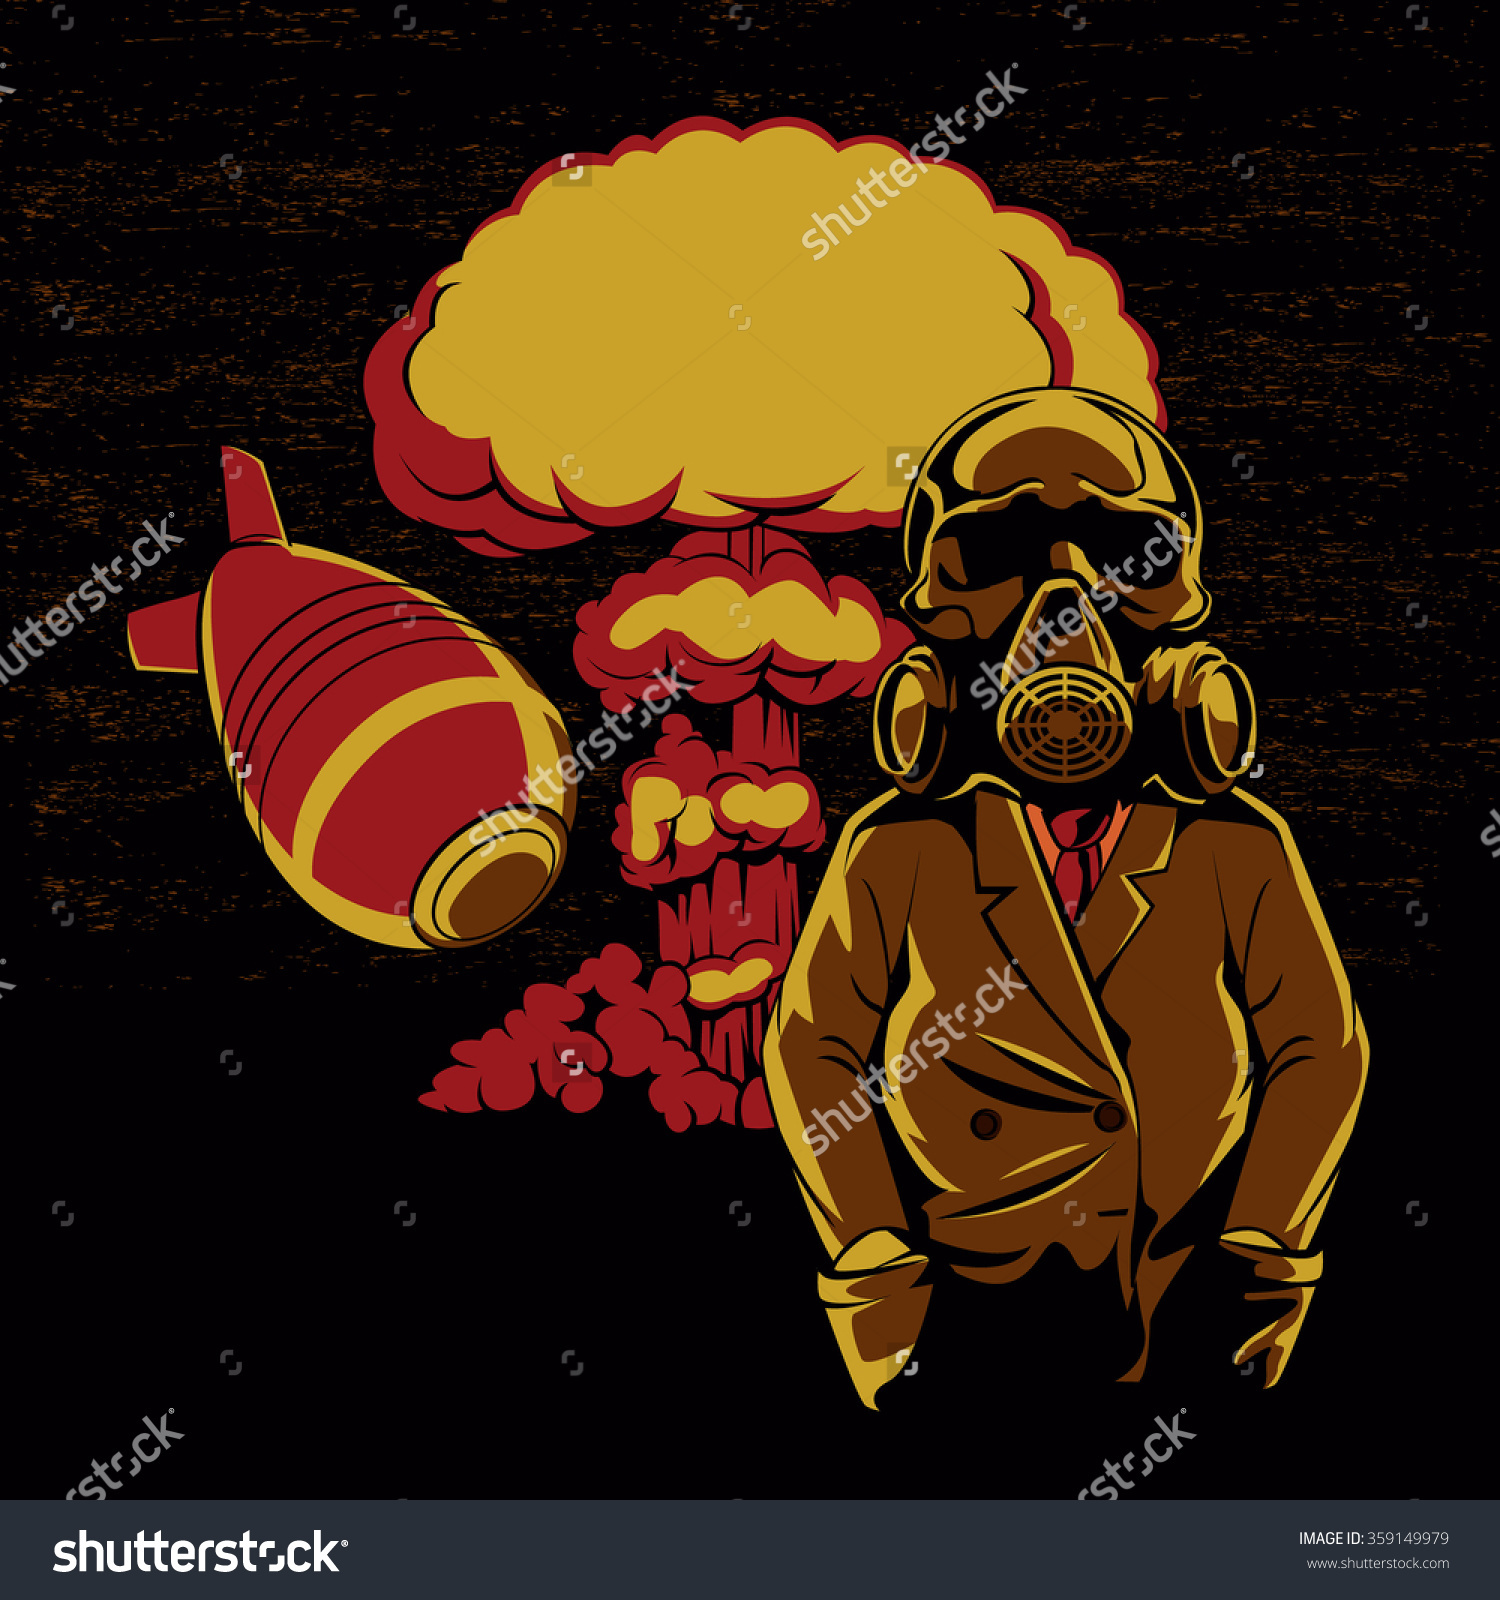 Nuclear Explosion Skull Gas Mask Illustrationhydrogen Stock Vector.